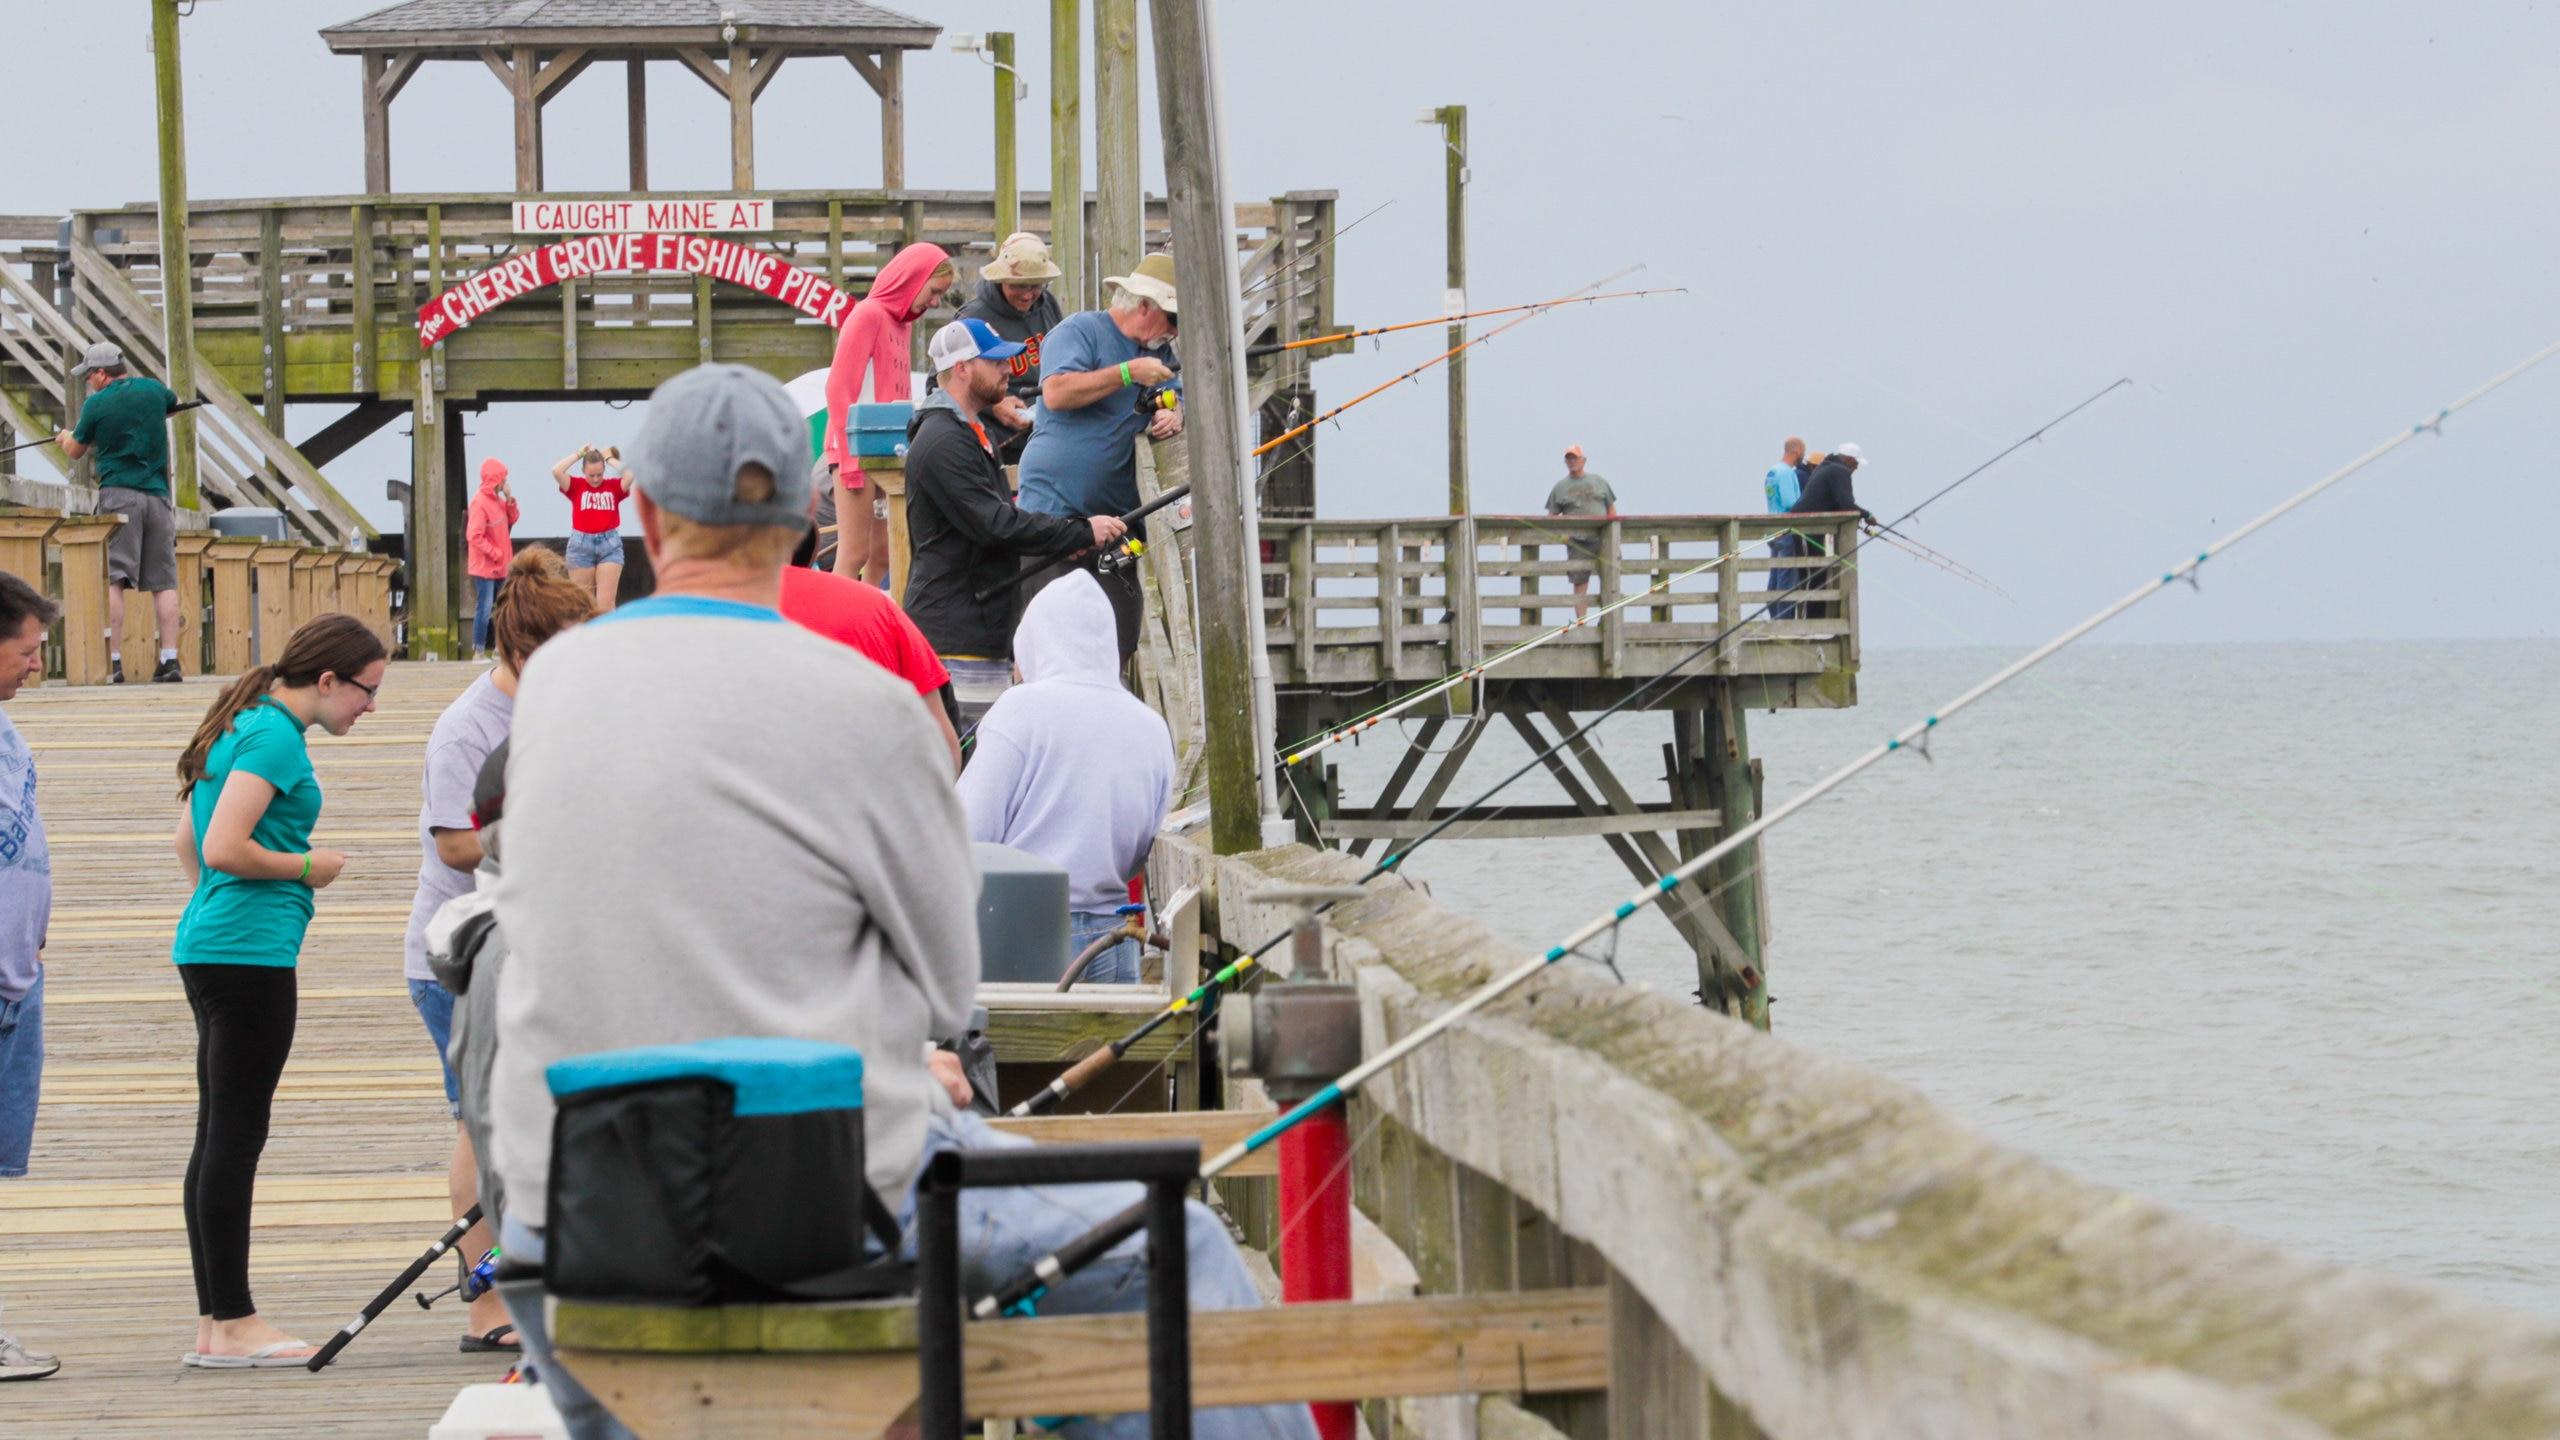 Cherry Grove Pier, North Myrtle Beach, South Carolina, United States of America